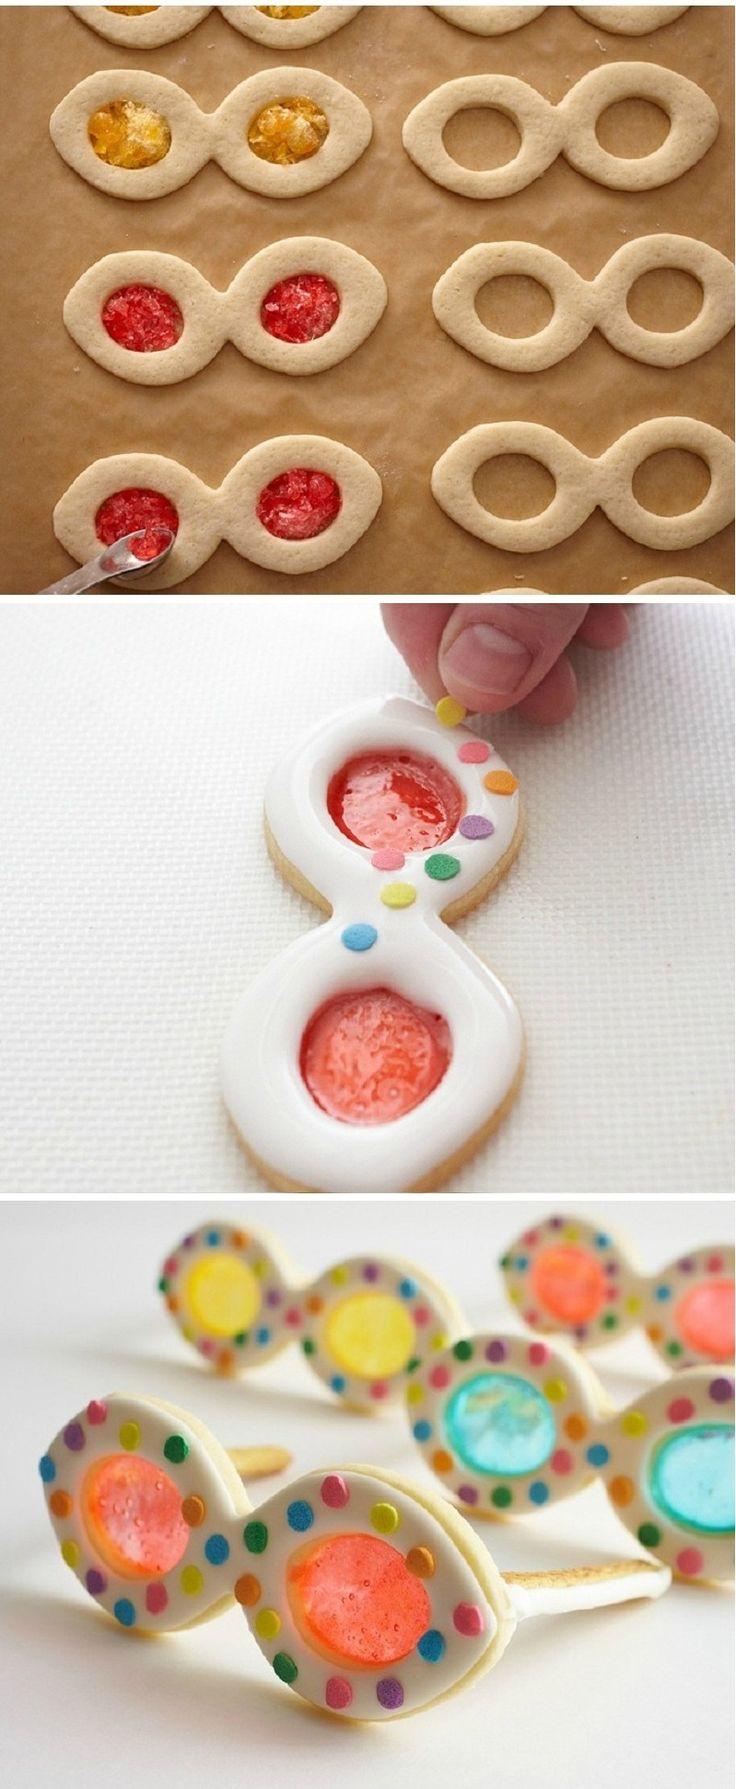 Fantastici biscotti occhiali! #vetro #cucina #ricette #originali #originalità #creatività